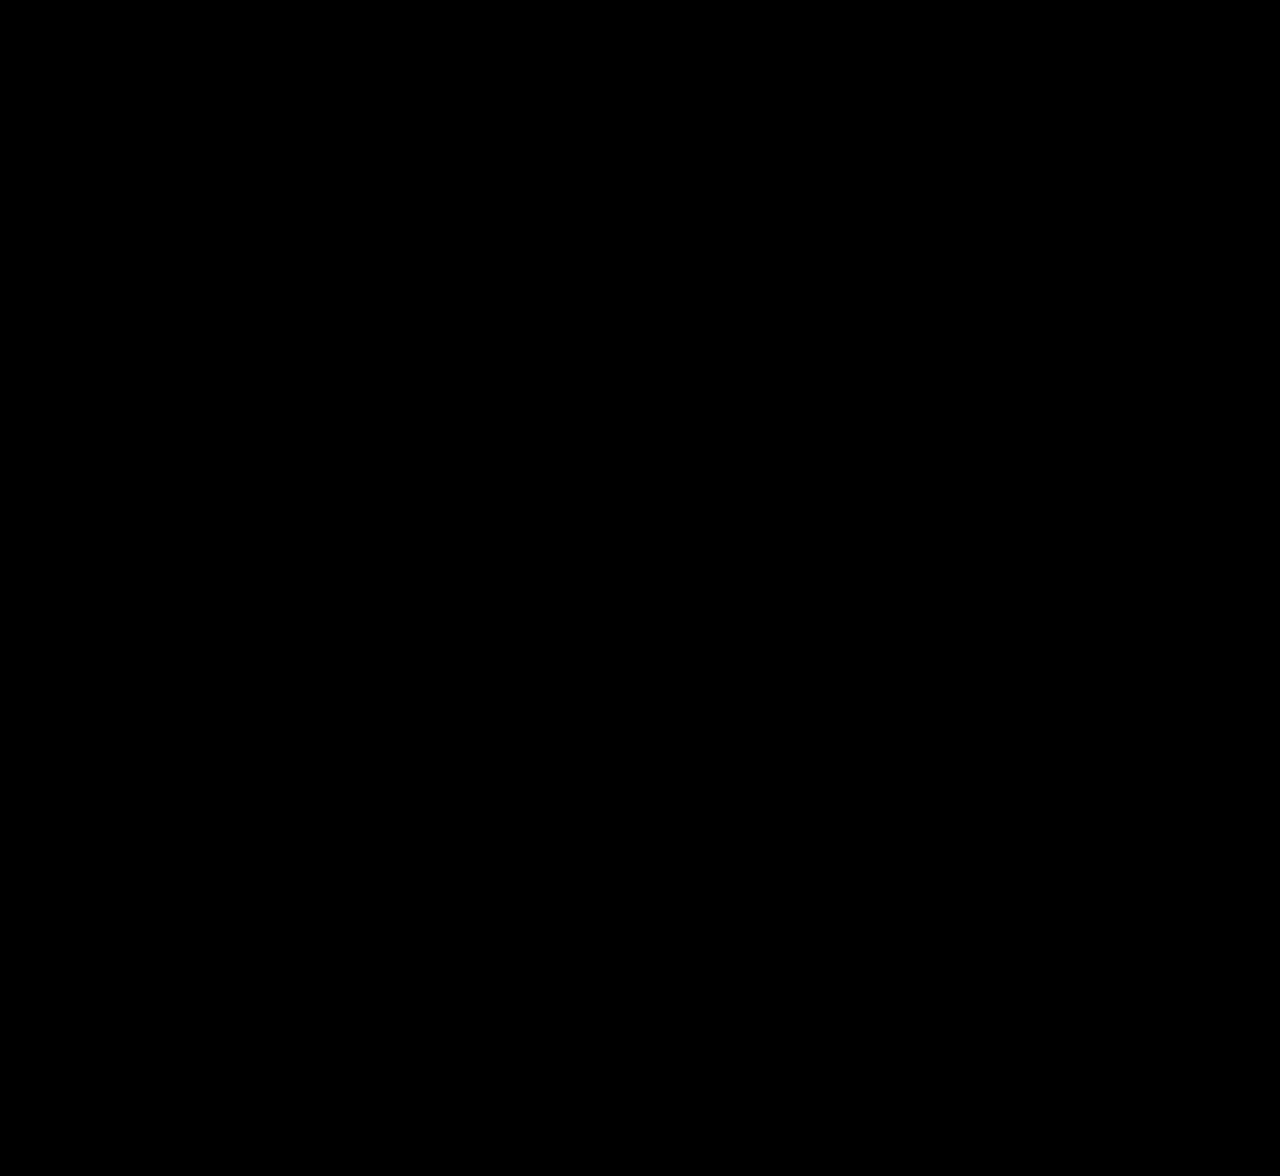 Openclip_vectors